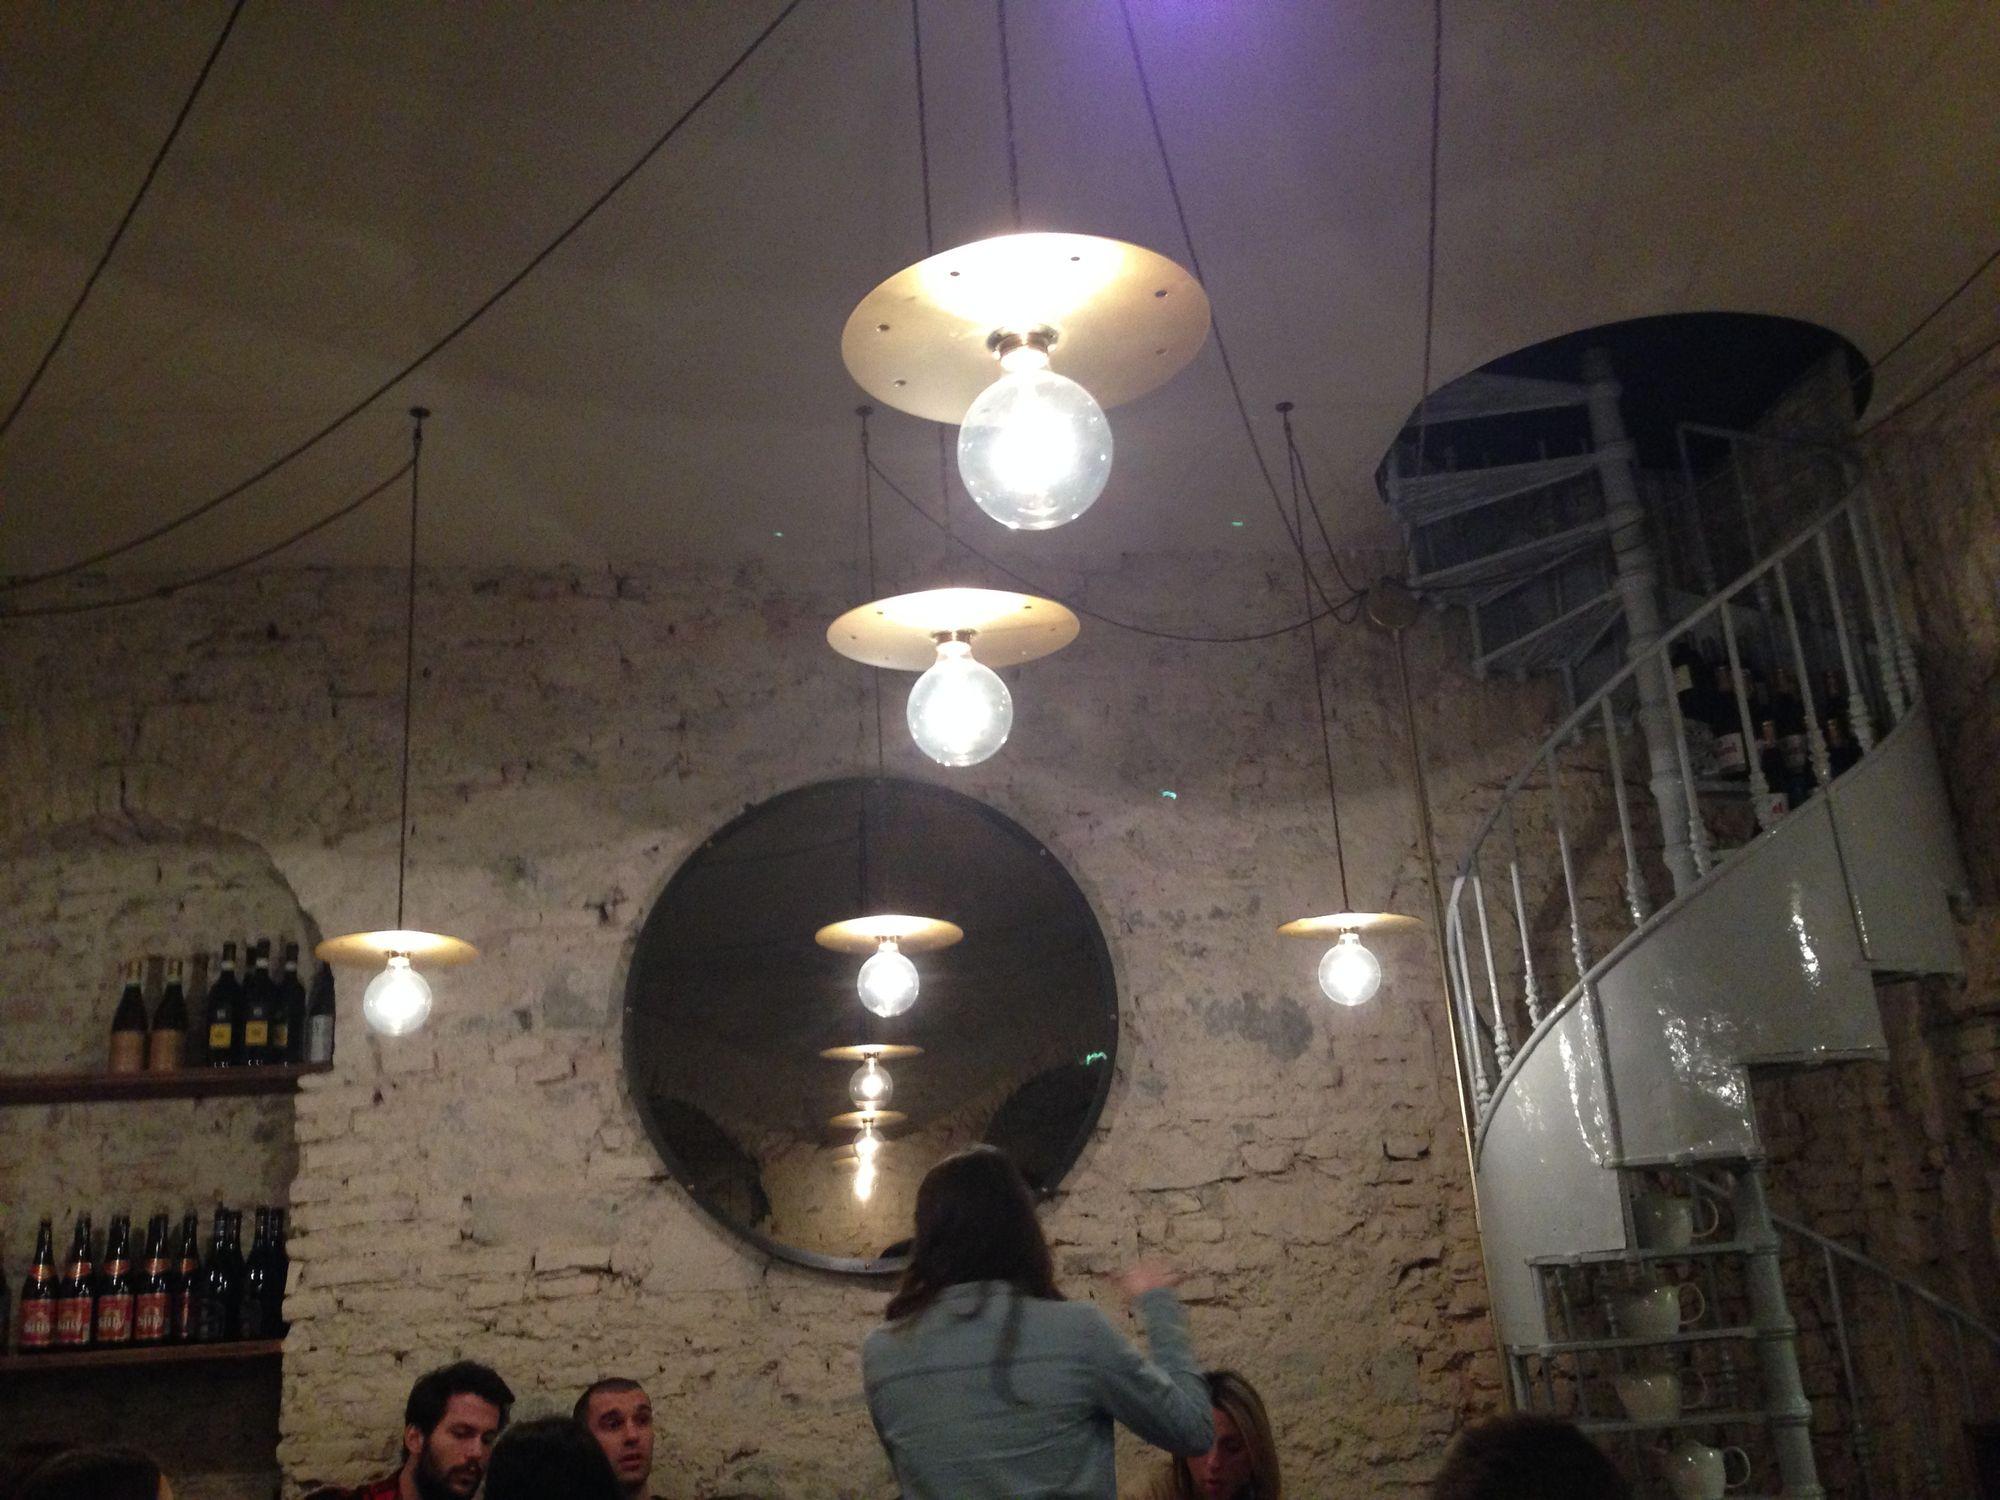 Fishbar de Milan a Brera, pesce sì ma divertente, con crudi, thai soup e fishburger – Puntarella ...